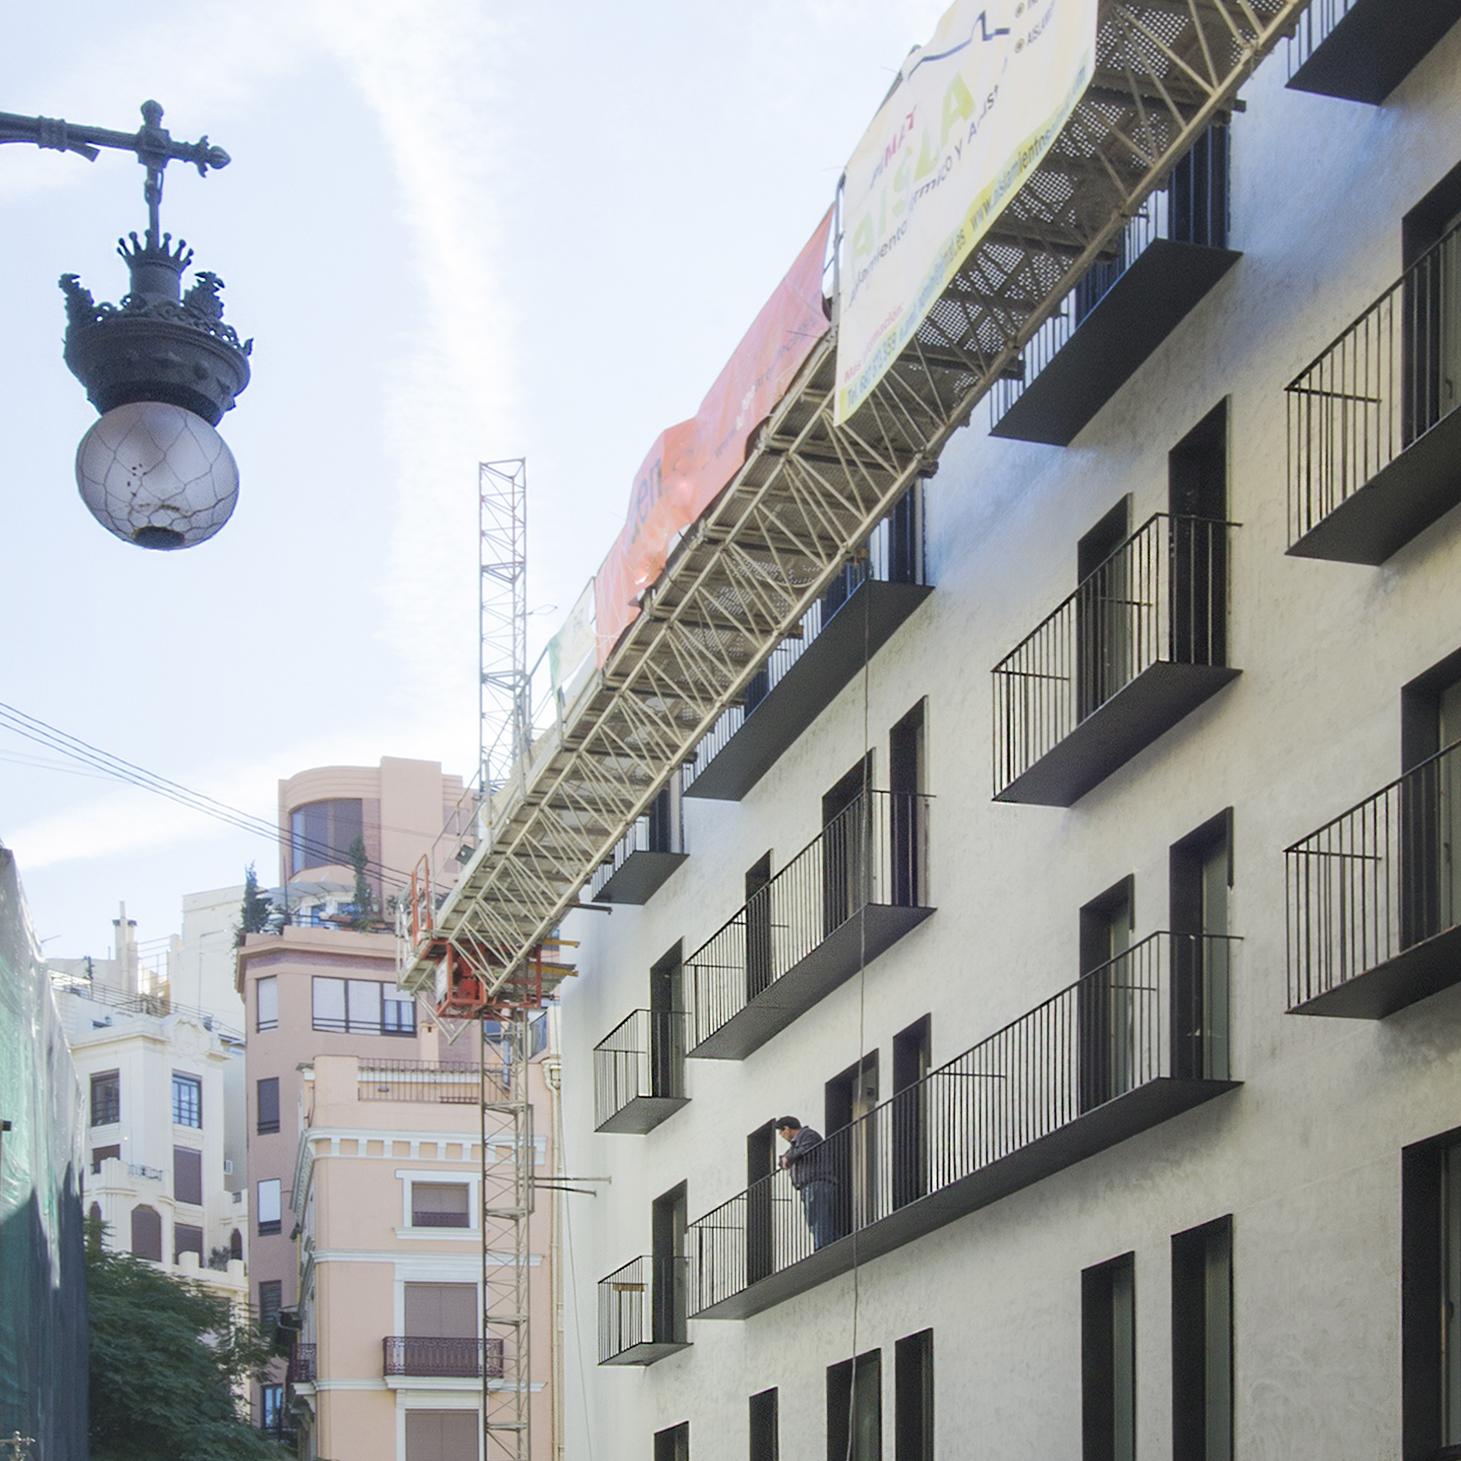 PV_EXT_M_along-street-construction_cropped_1x1_1900px_72DPI.jpg